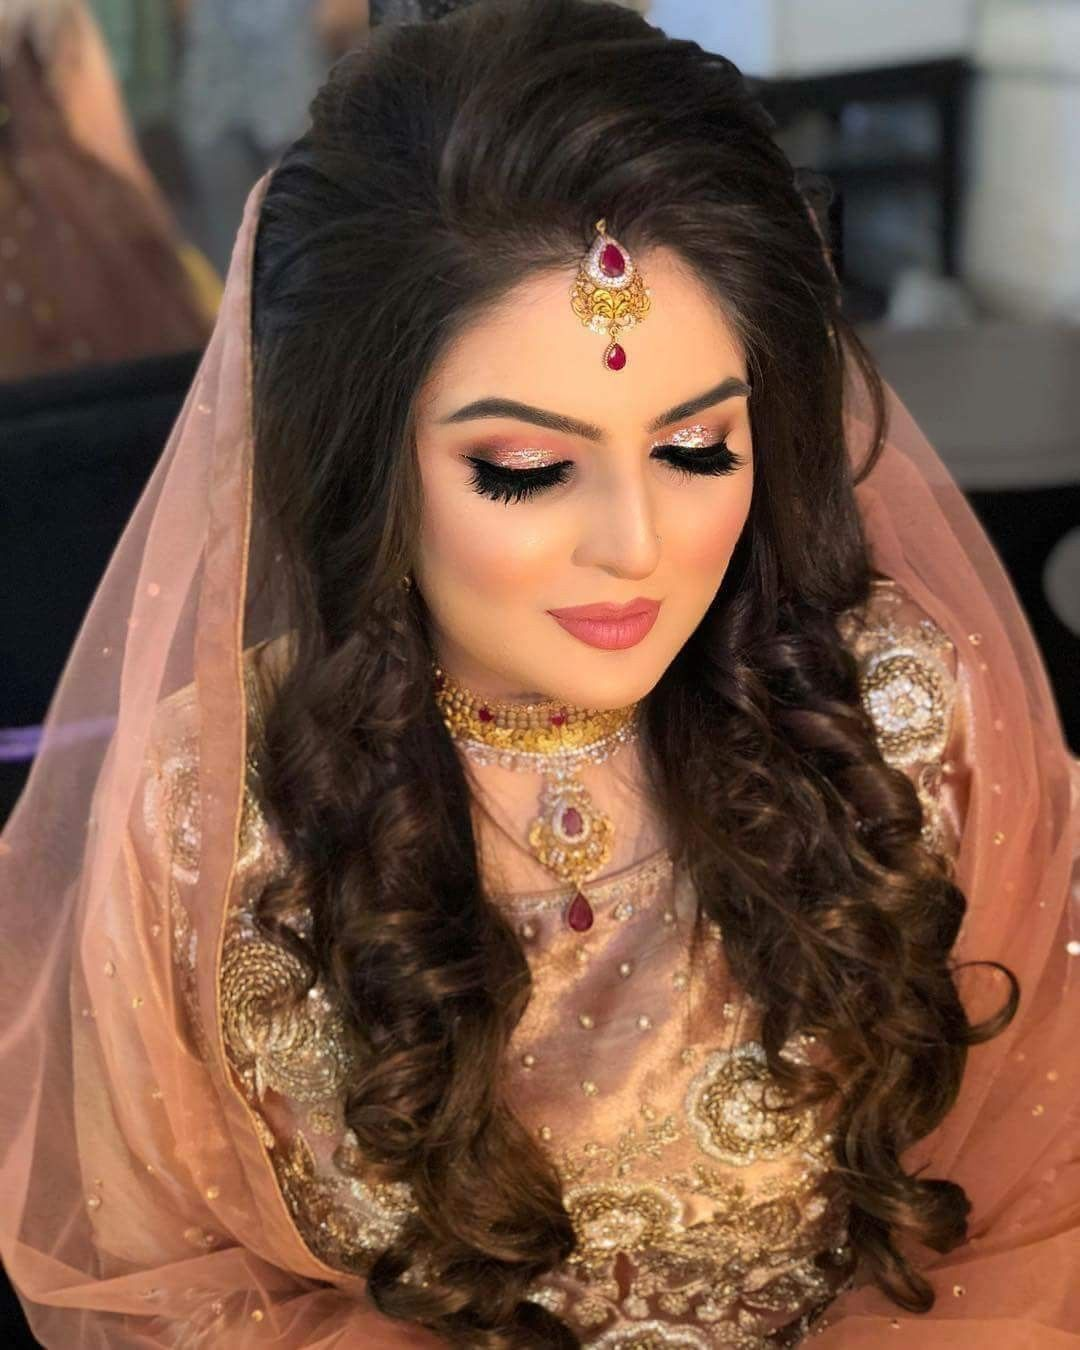 bridal makeup | bridal makeup in 2019 | wedding hairstyles